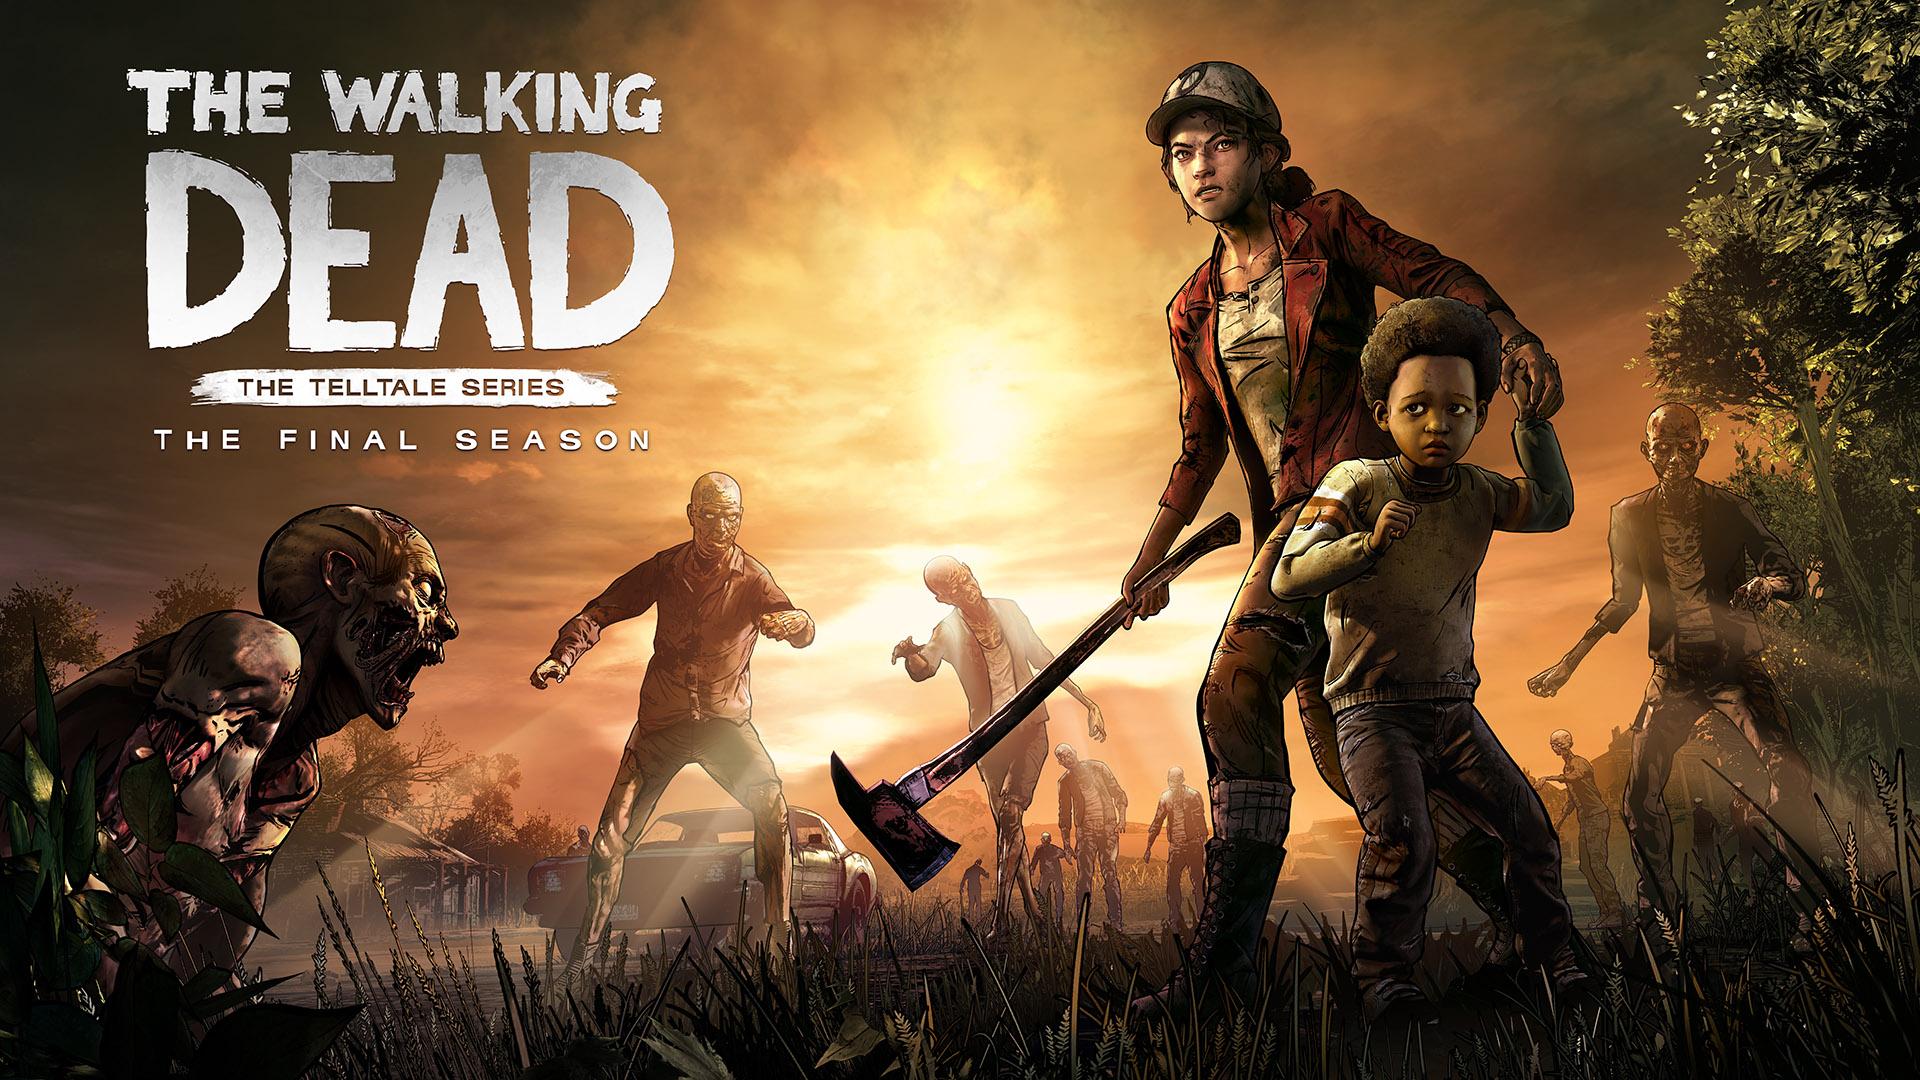 the-walking-dead-la-temporada-final-llega-a-las-tiendas1-el-6-de-noviembre-frikigamers.com